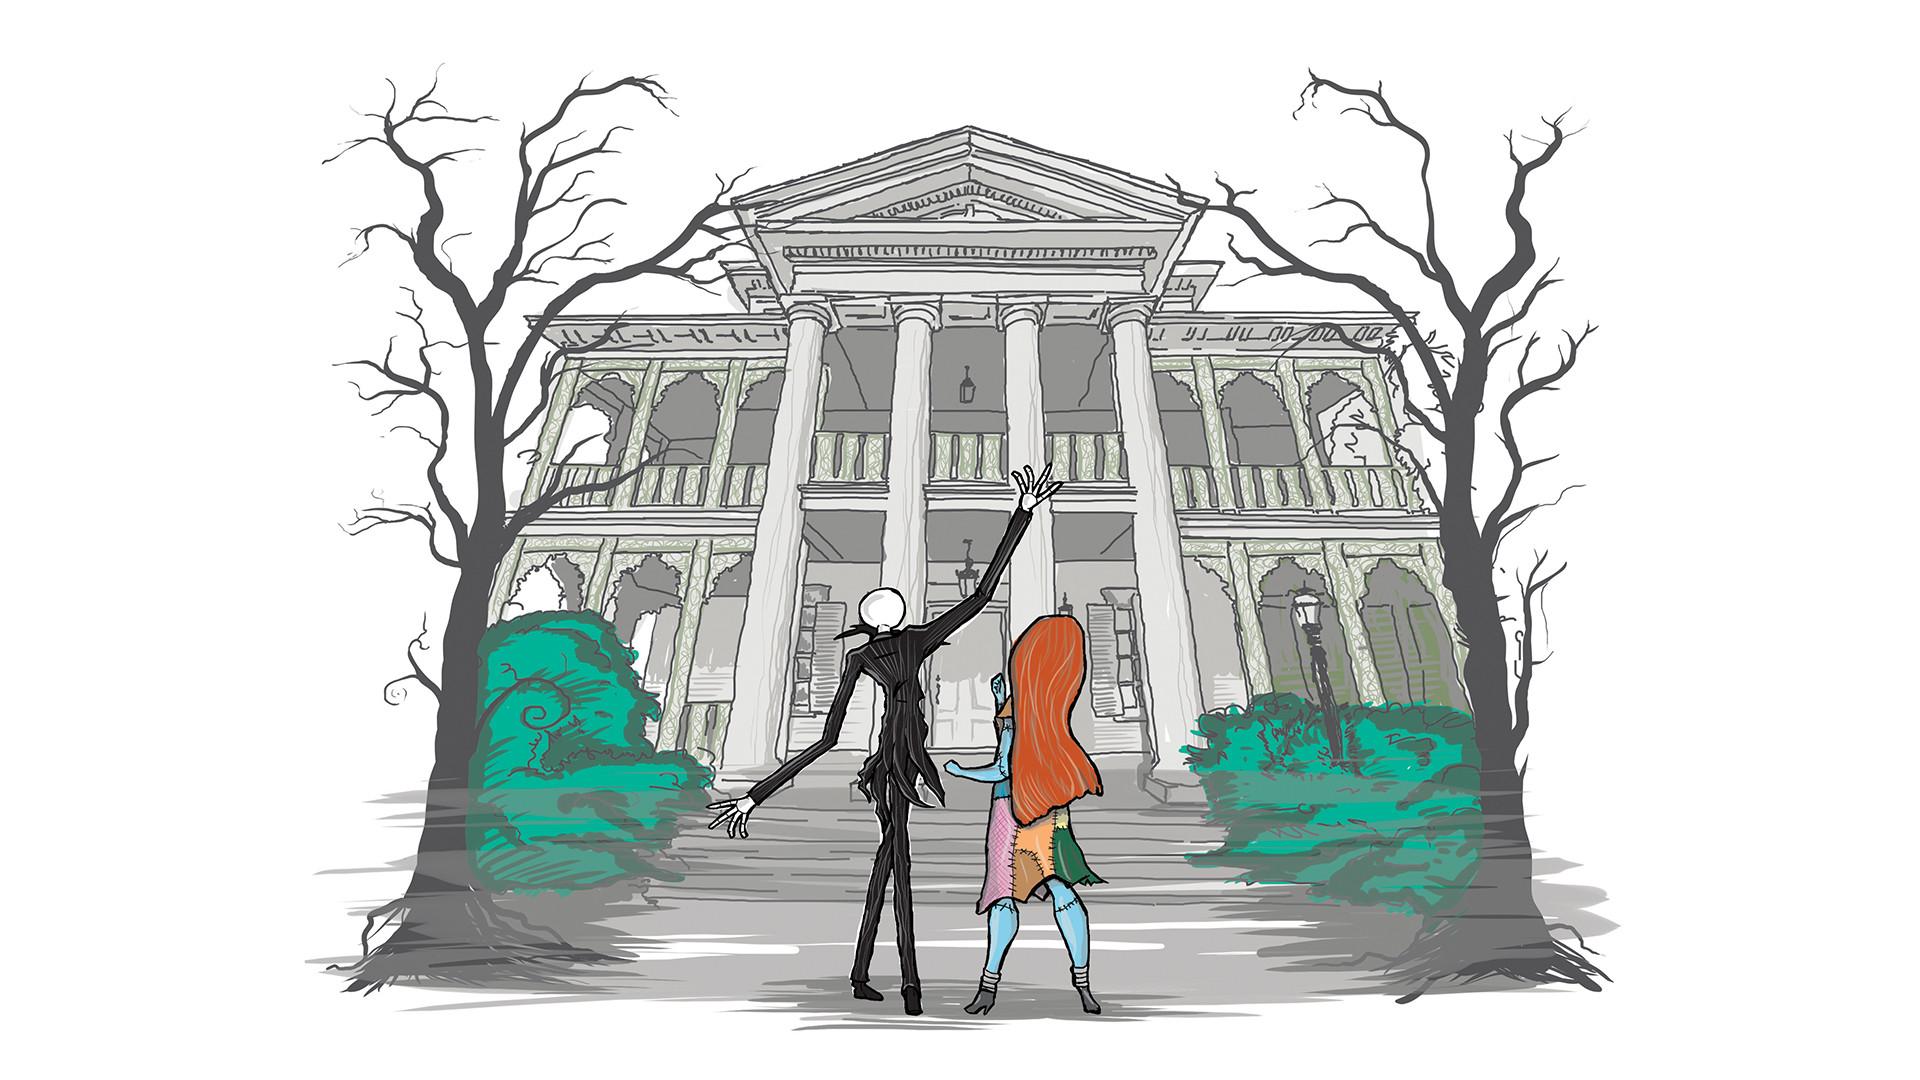 Wallpaper Wednesday: Disneyland Haunted Mansion